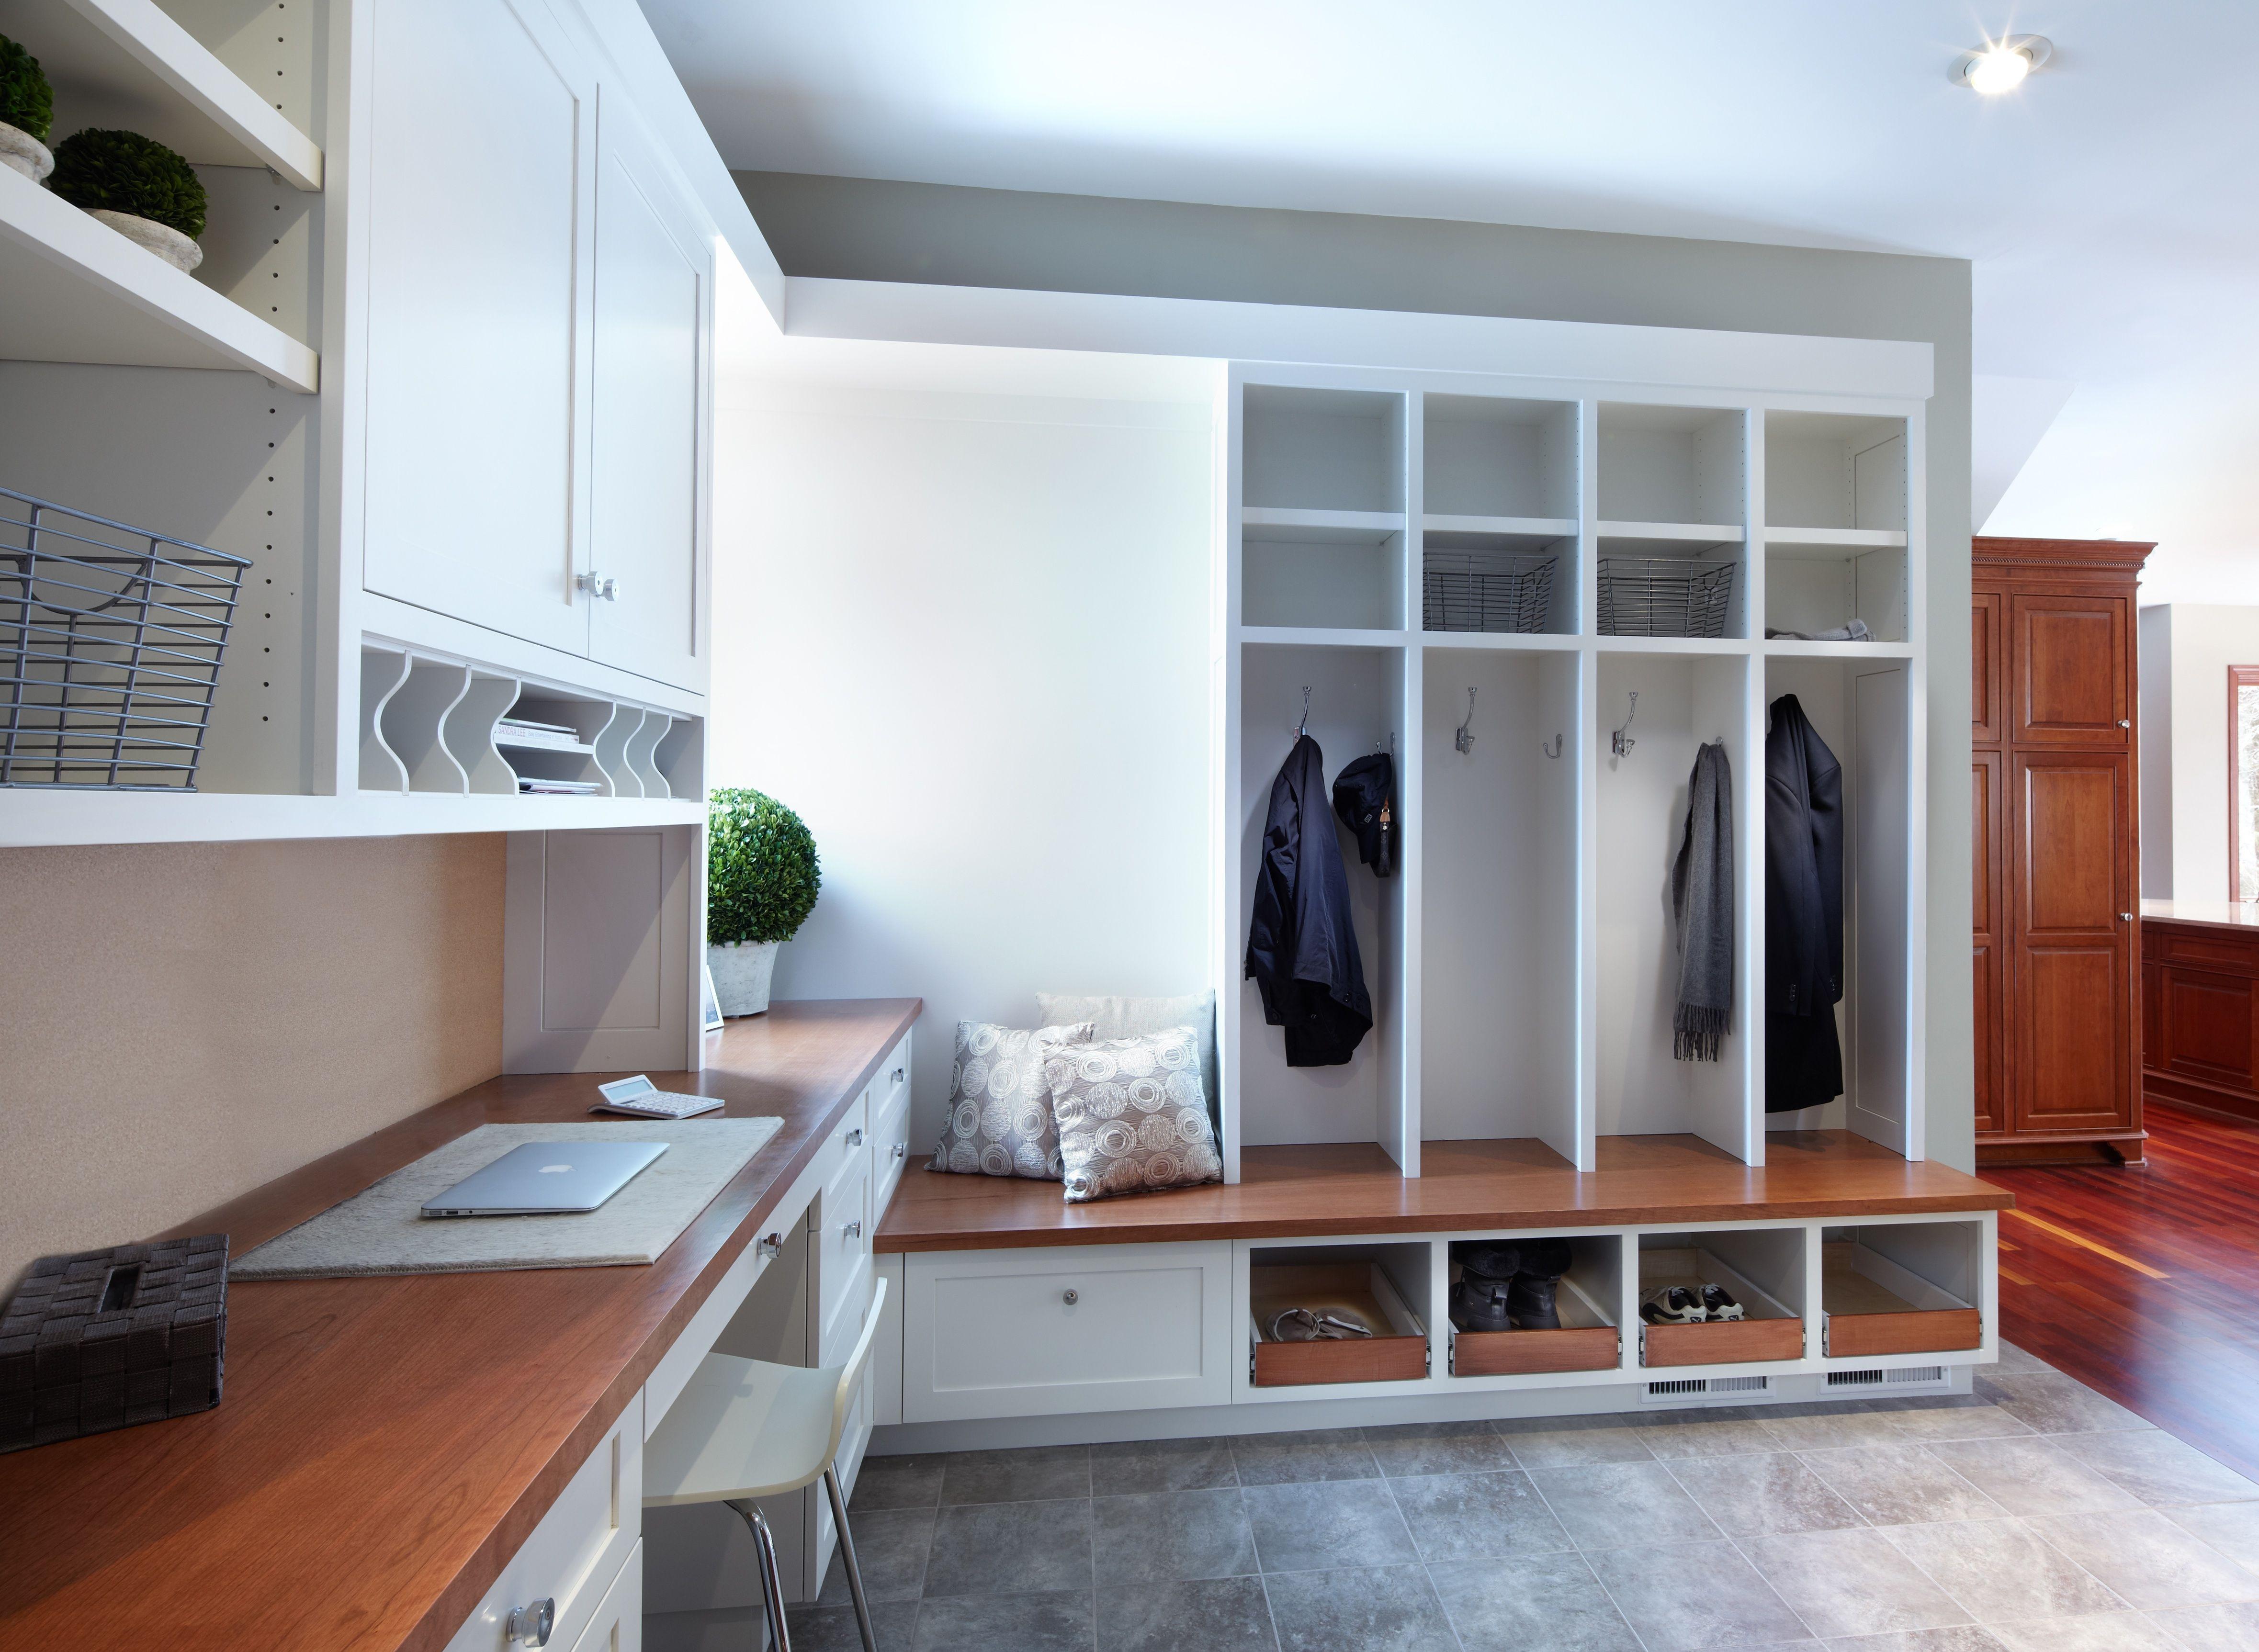 White Cabinets Coat Lockers Coat Storage Coat Closet